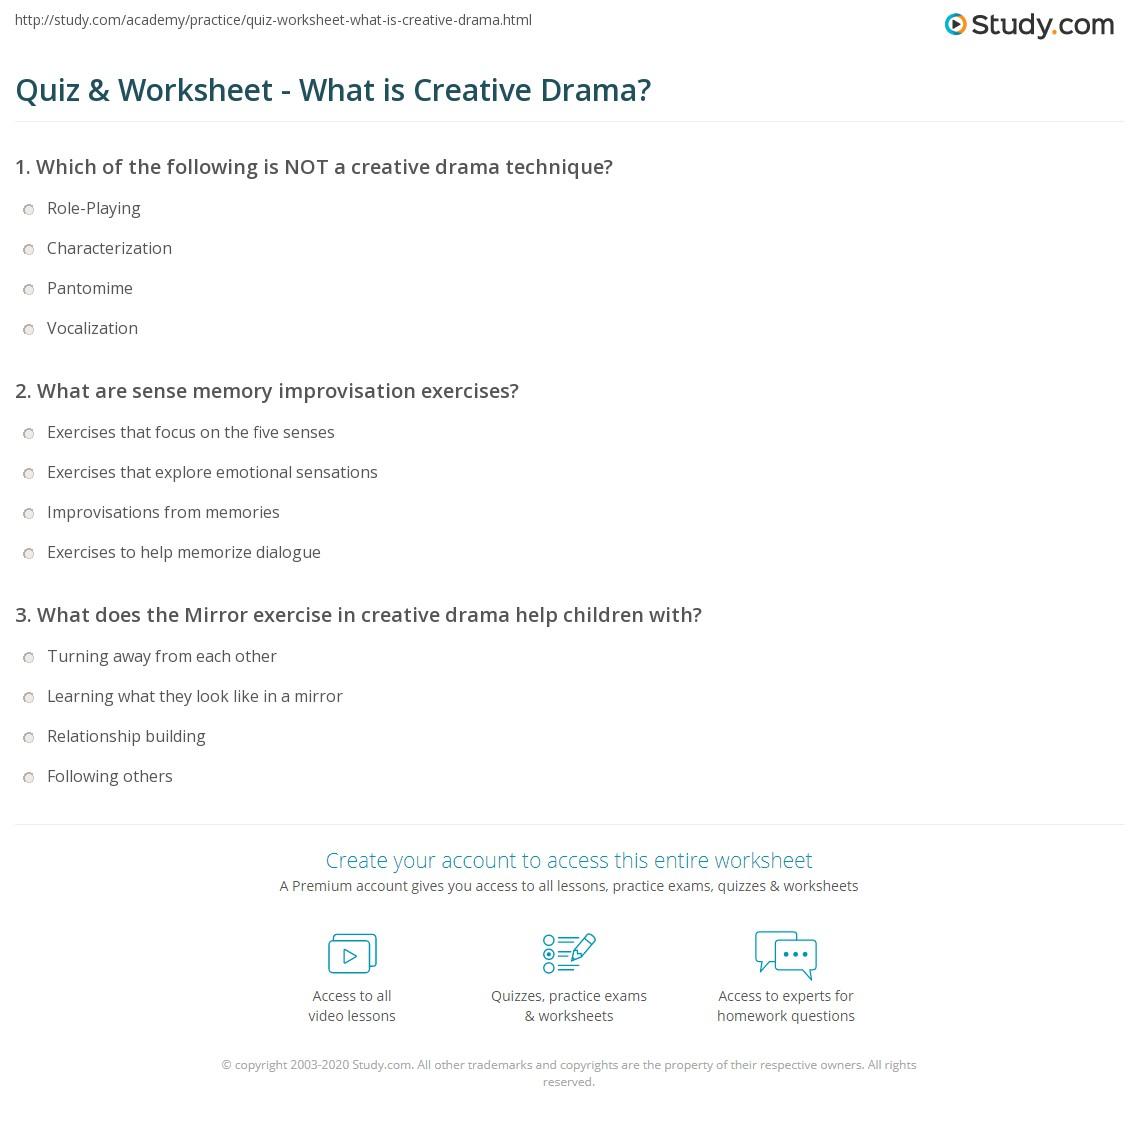 Quiz & Worksheet - What is Creative Drama? | Study.com